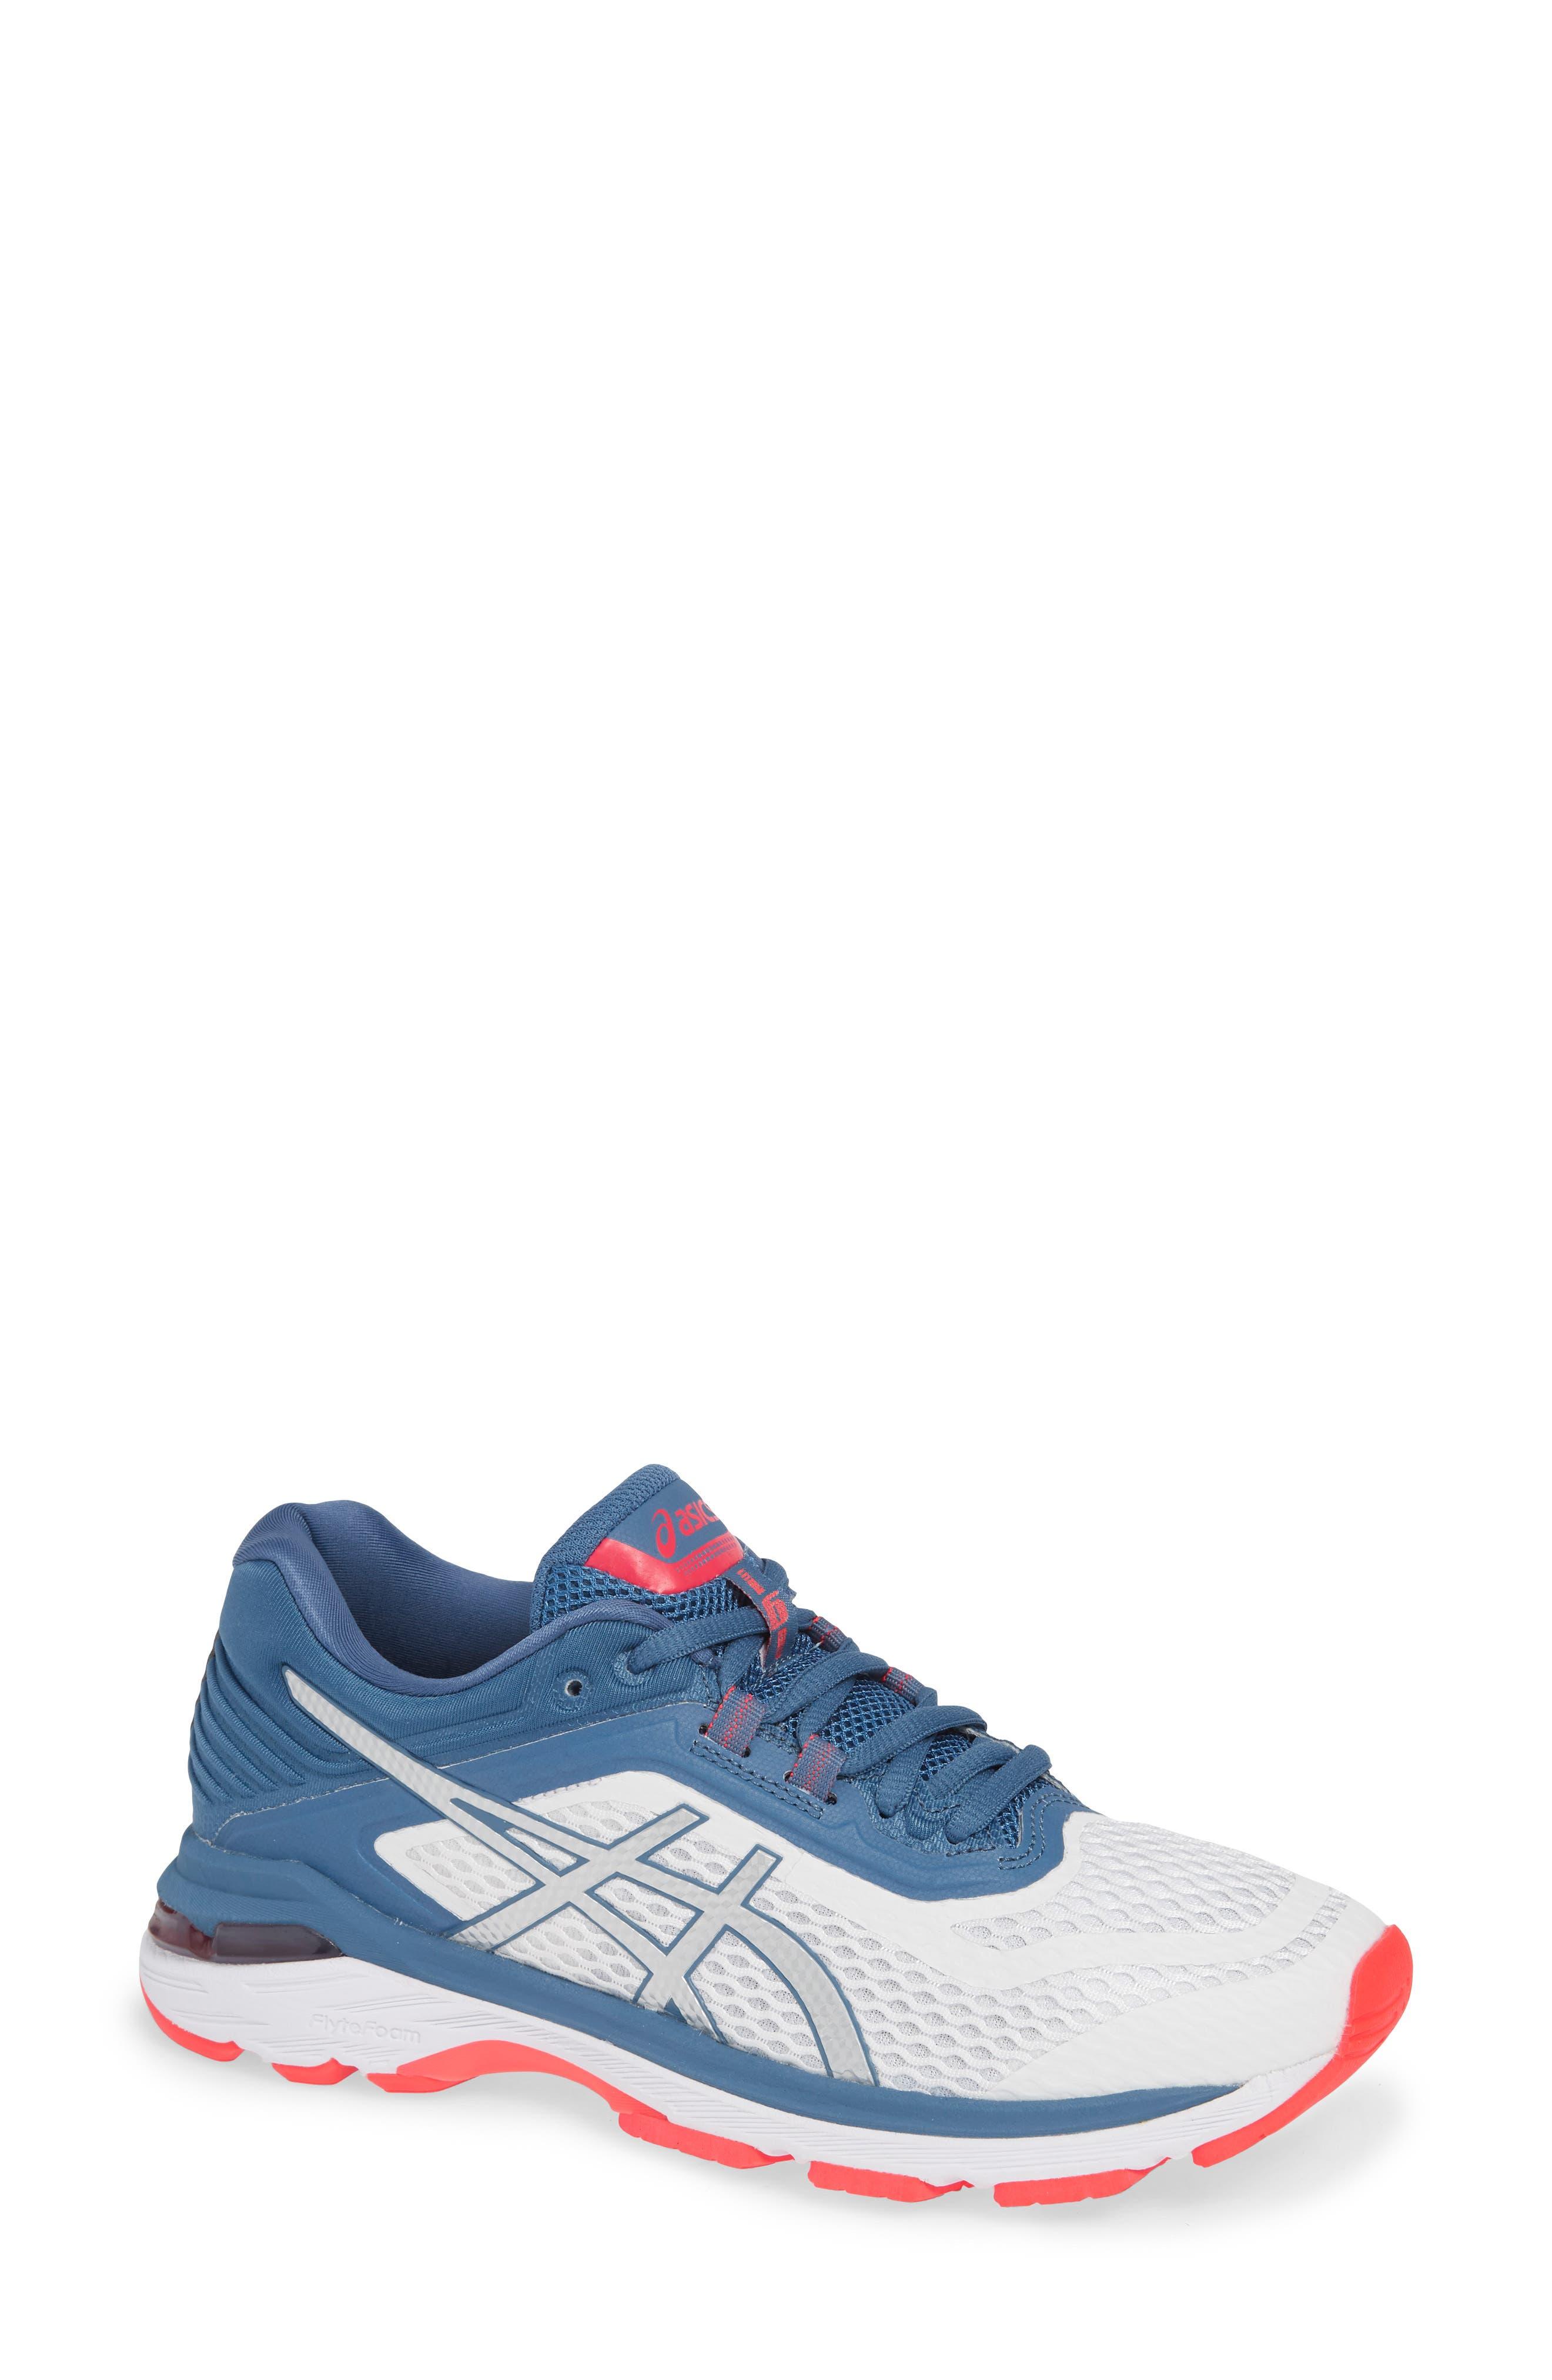 GT-2000 6 Running Shoe,                             Main thumbnail 1, color,                             400